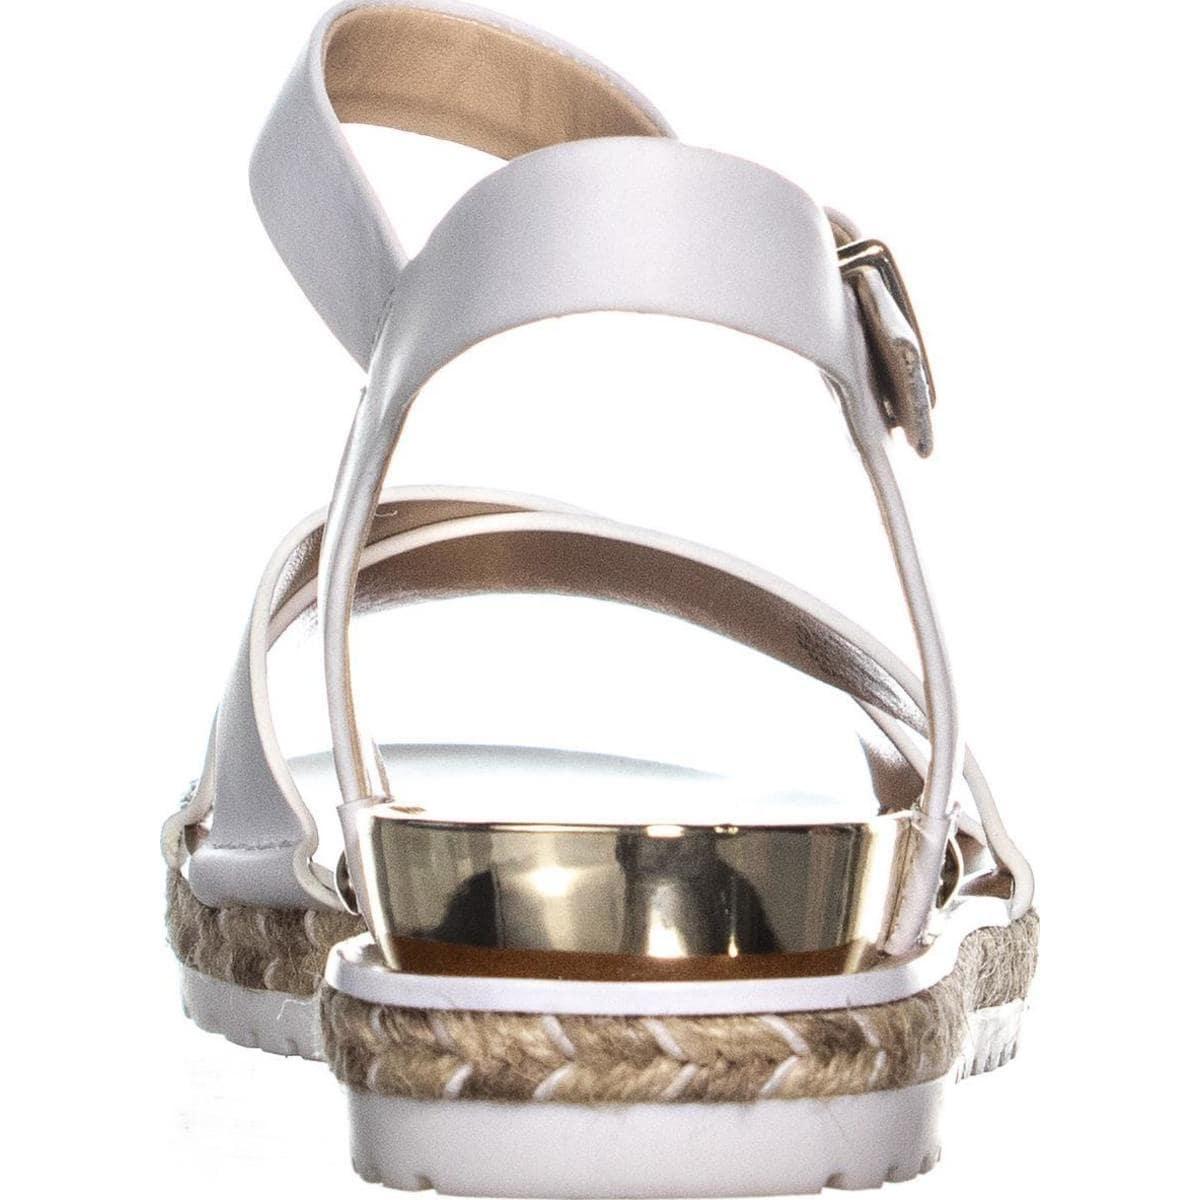 86a8fce14a7 Shop Vince Camuto Kankitta Sport Ankle Strap Sandals